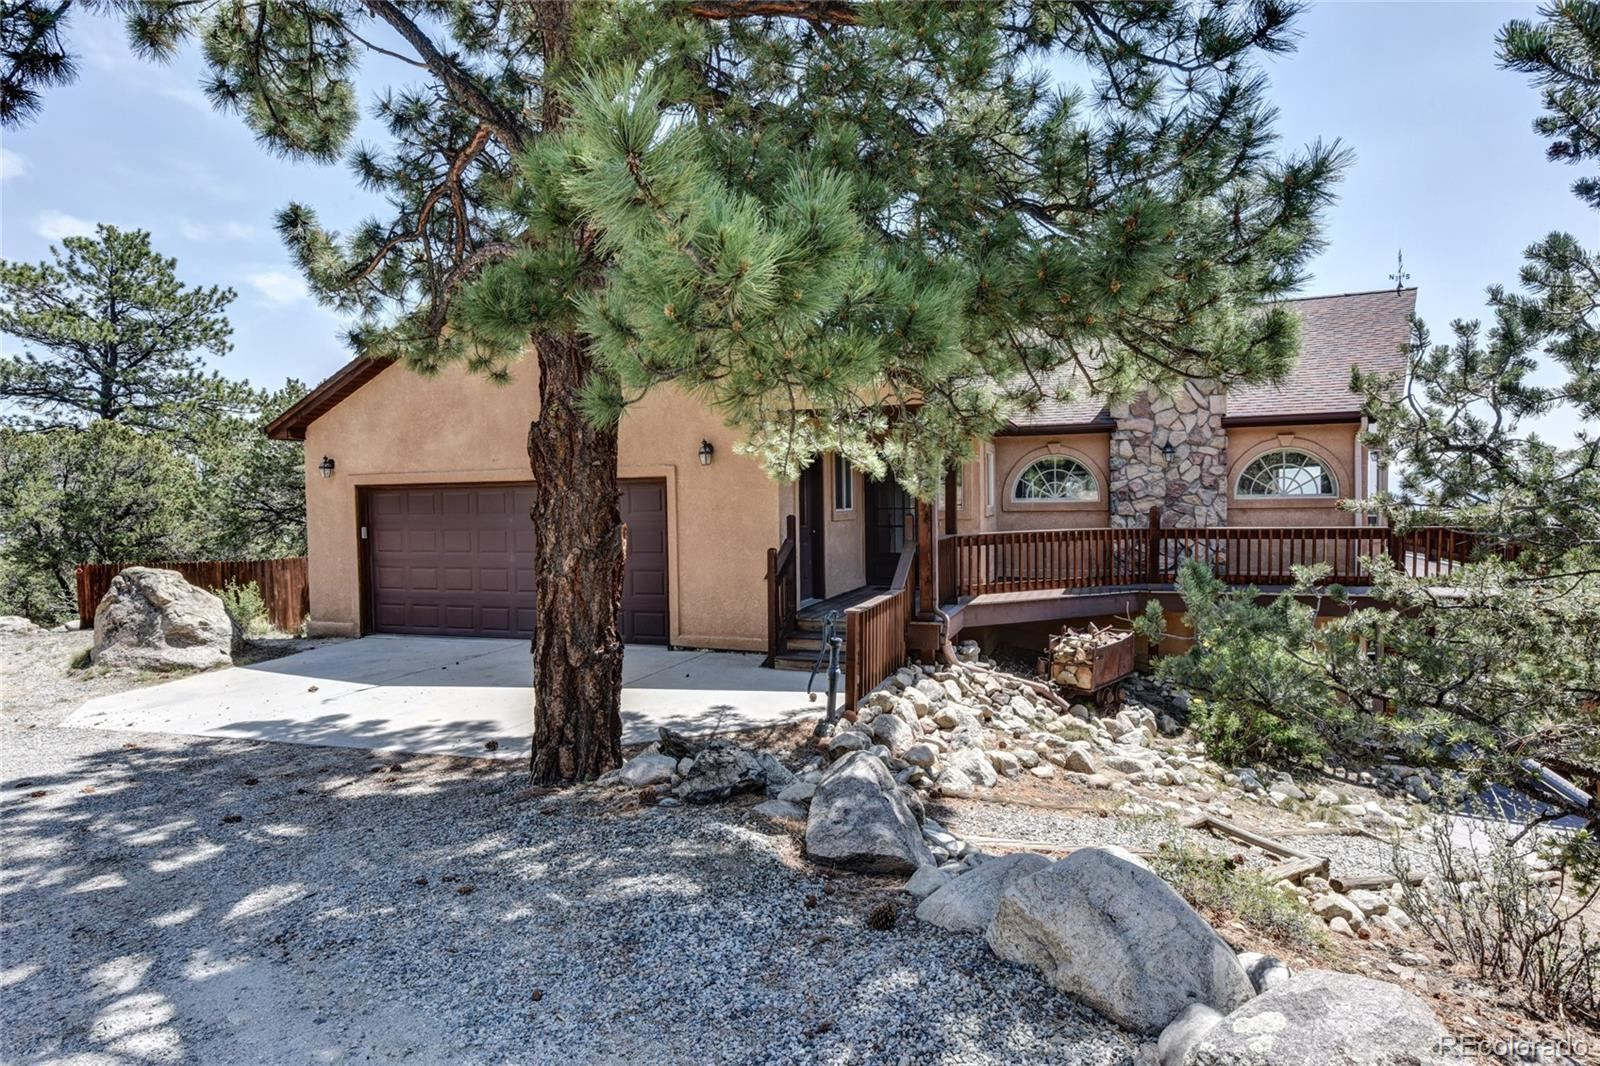 30202 Princeton Hills, Buena Vista, CO 81211 - #: 5886921